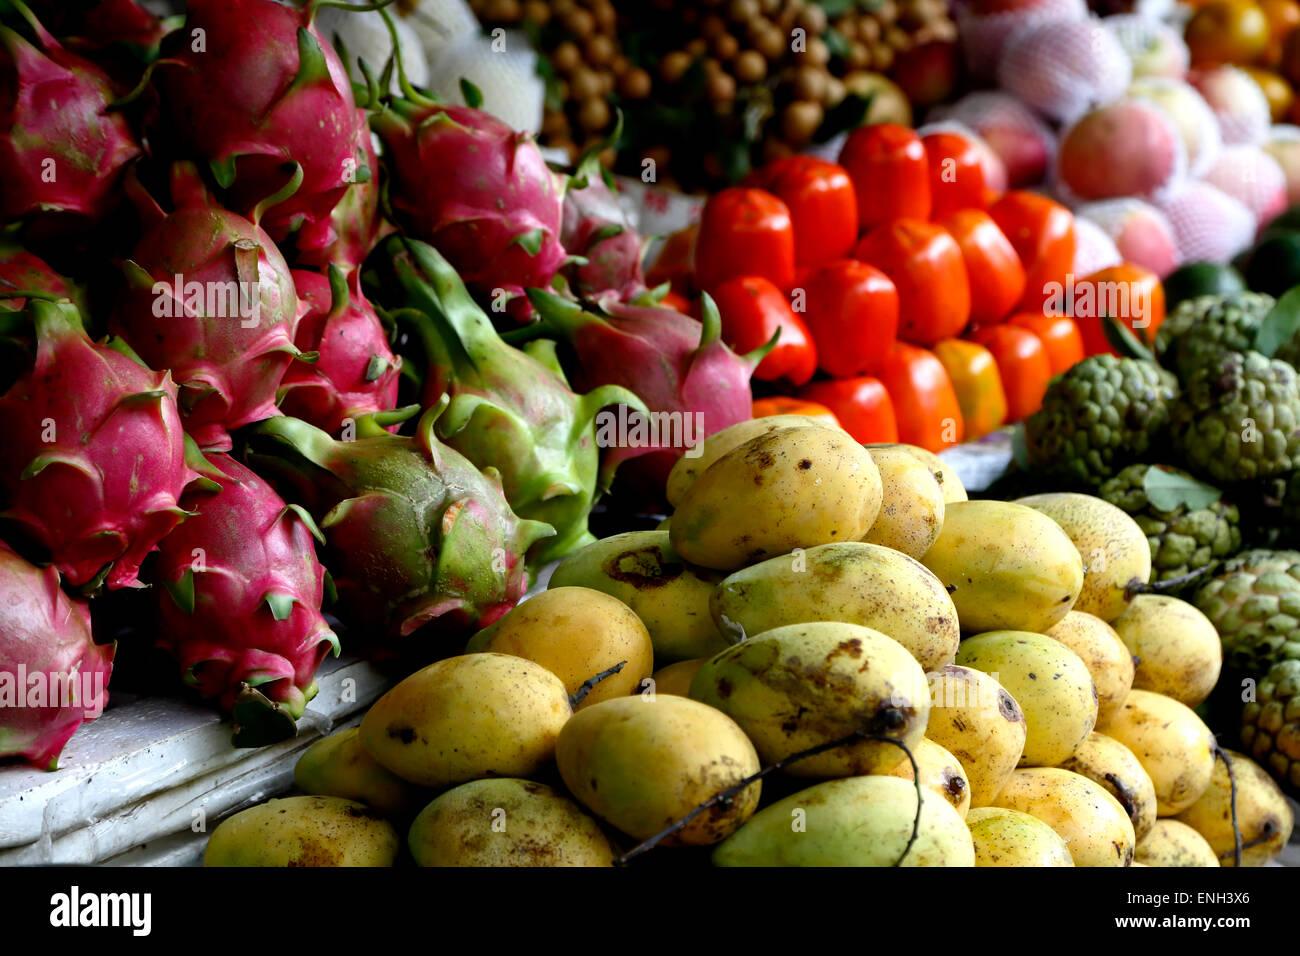 Colorful fruit display, Central Market, Hoi An, Vietnam - Stock Image